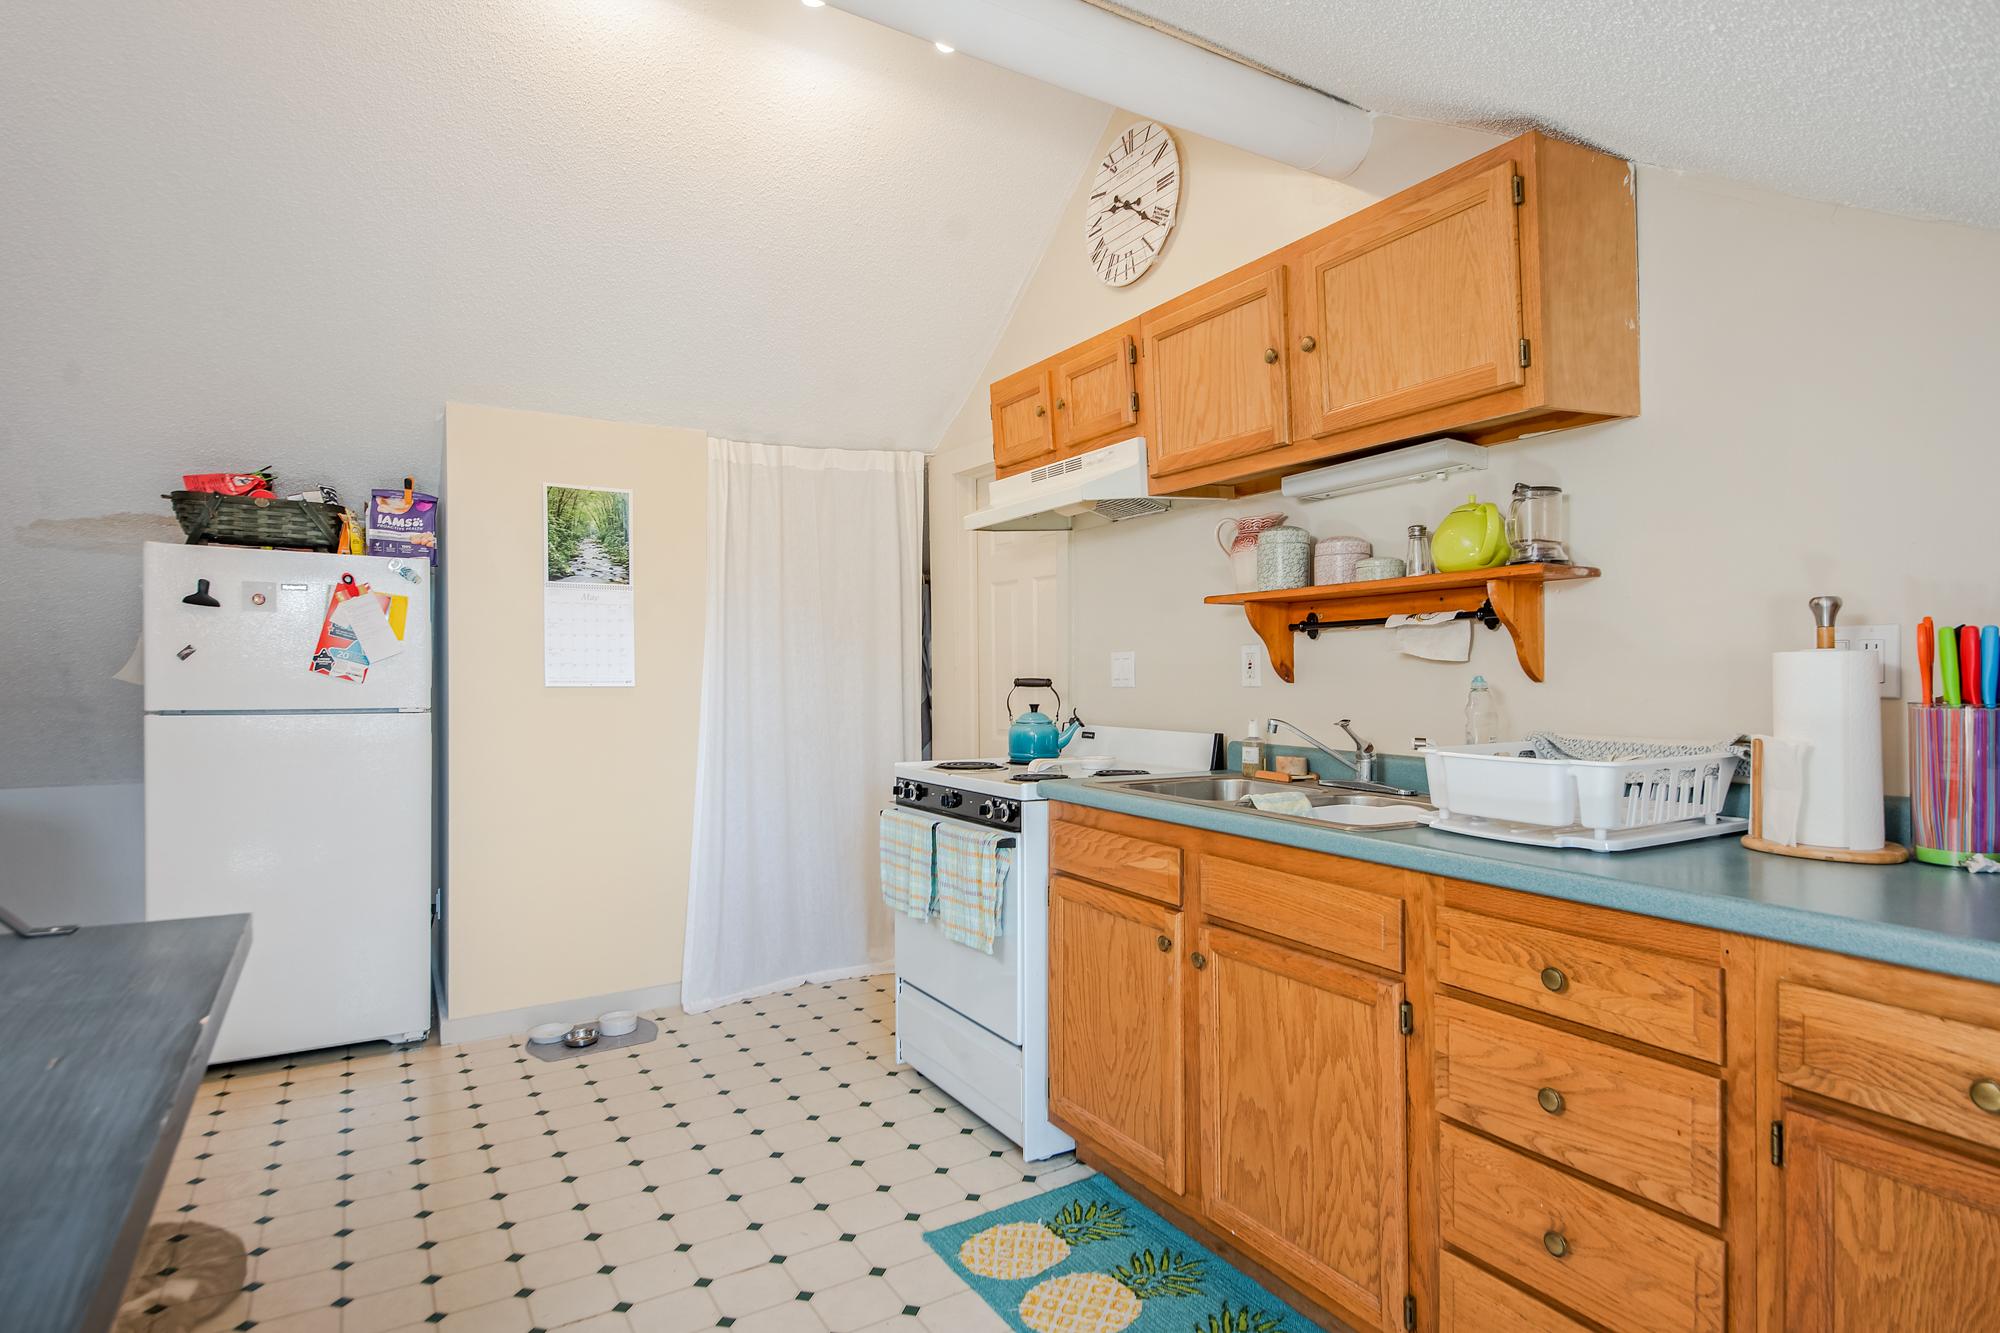 51-53 Prospect-kitchen24.jpg